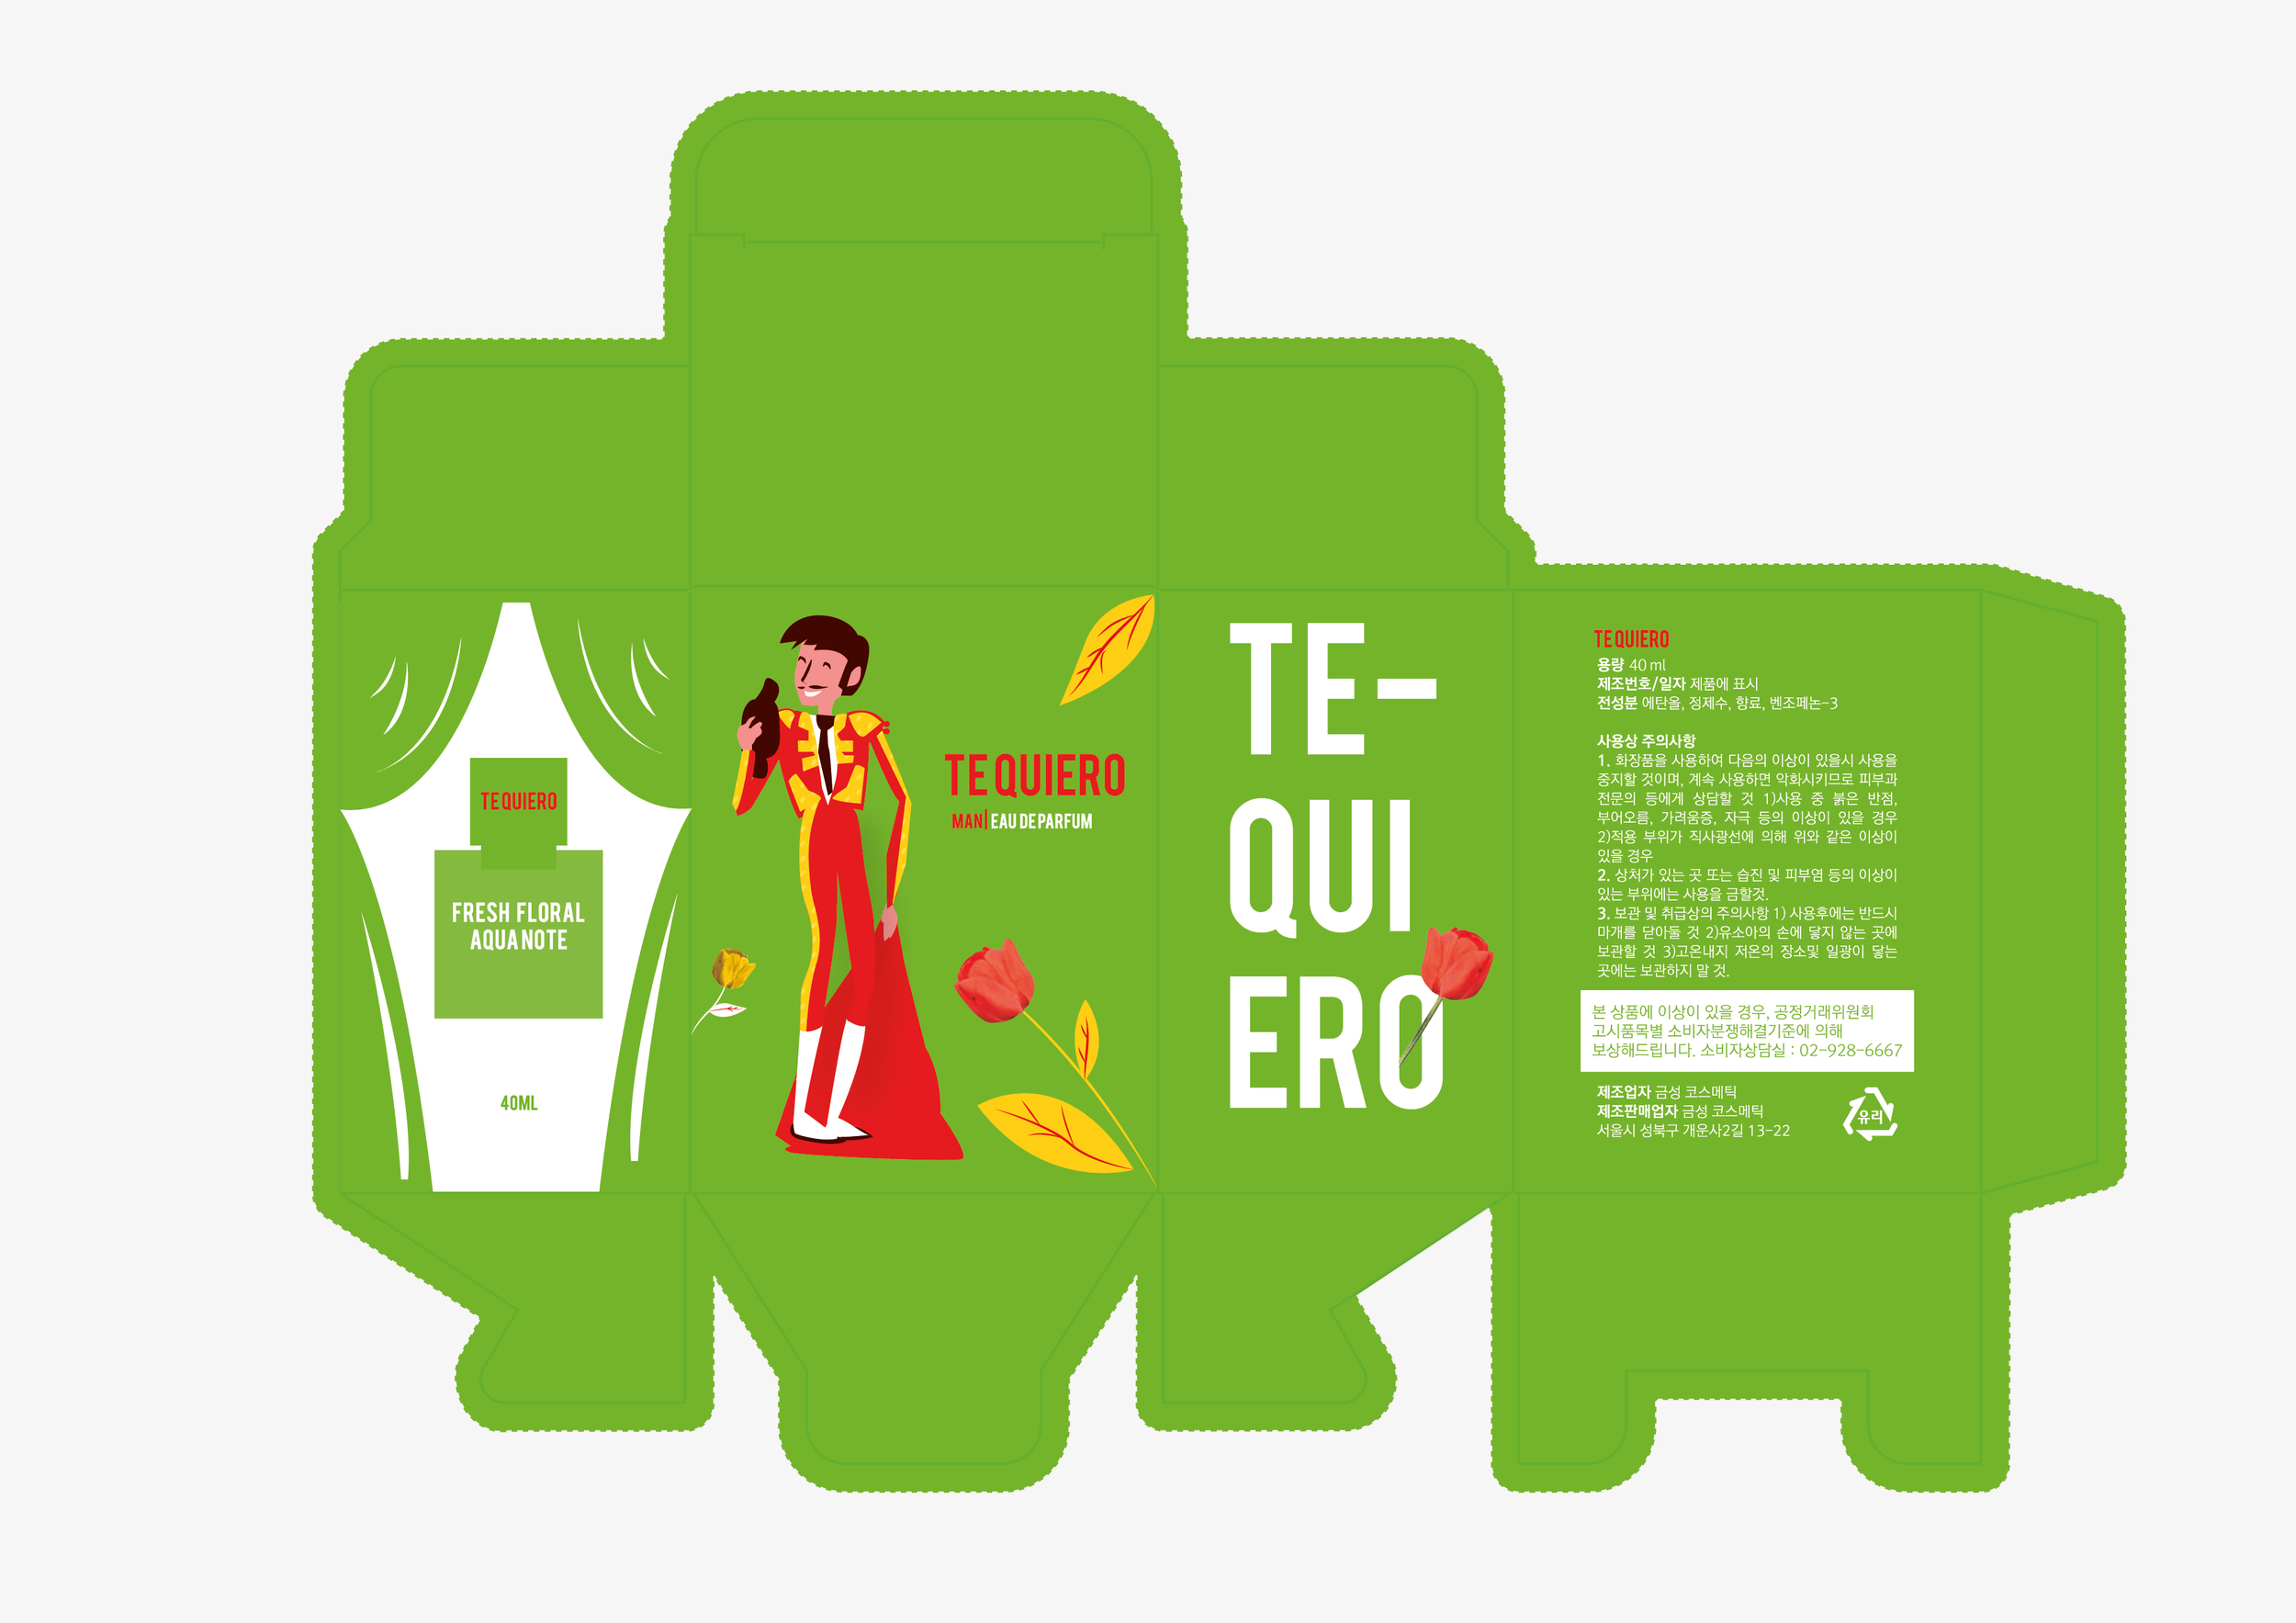 tequieroper_confondogris-03.png